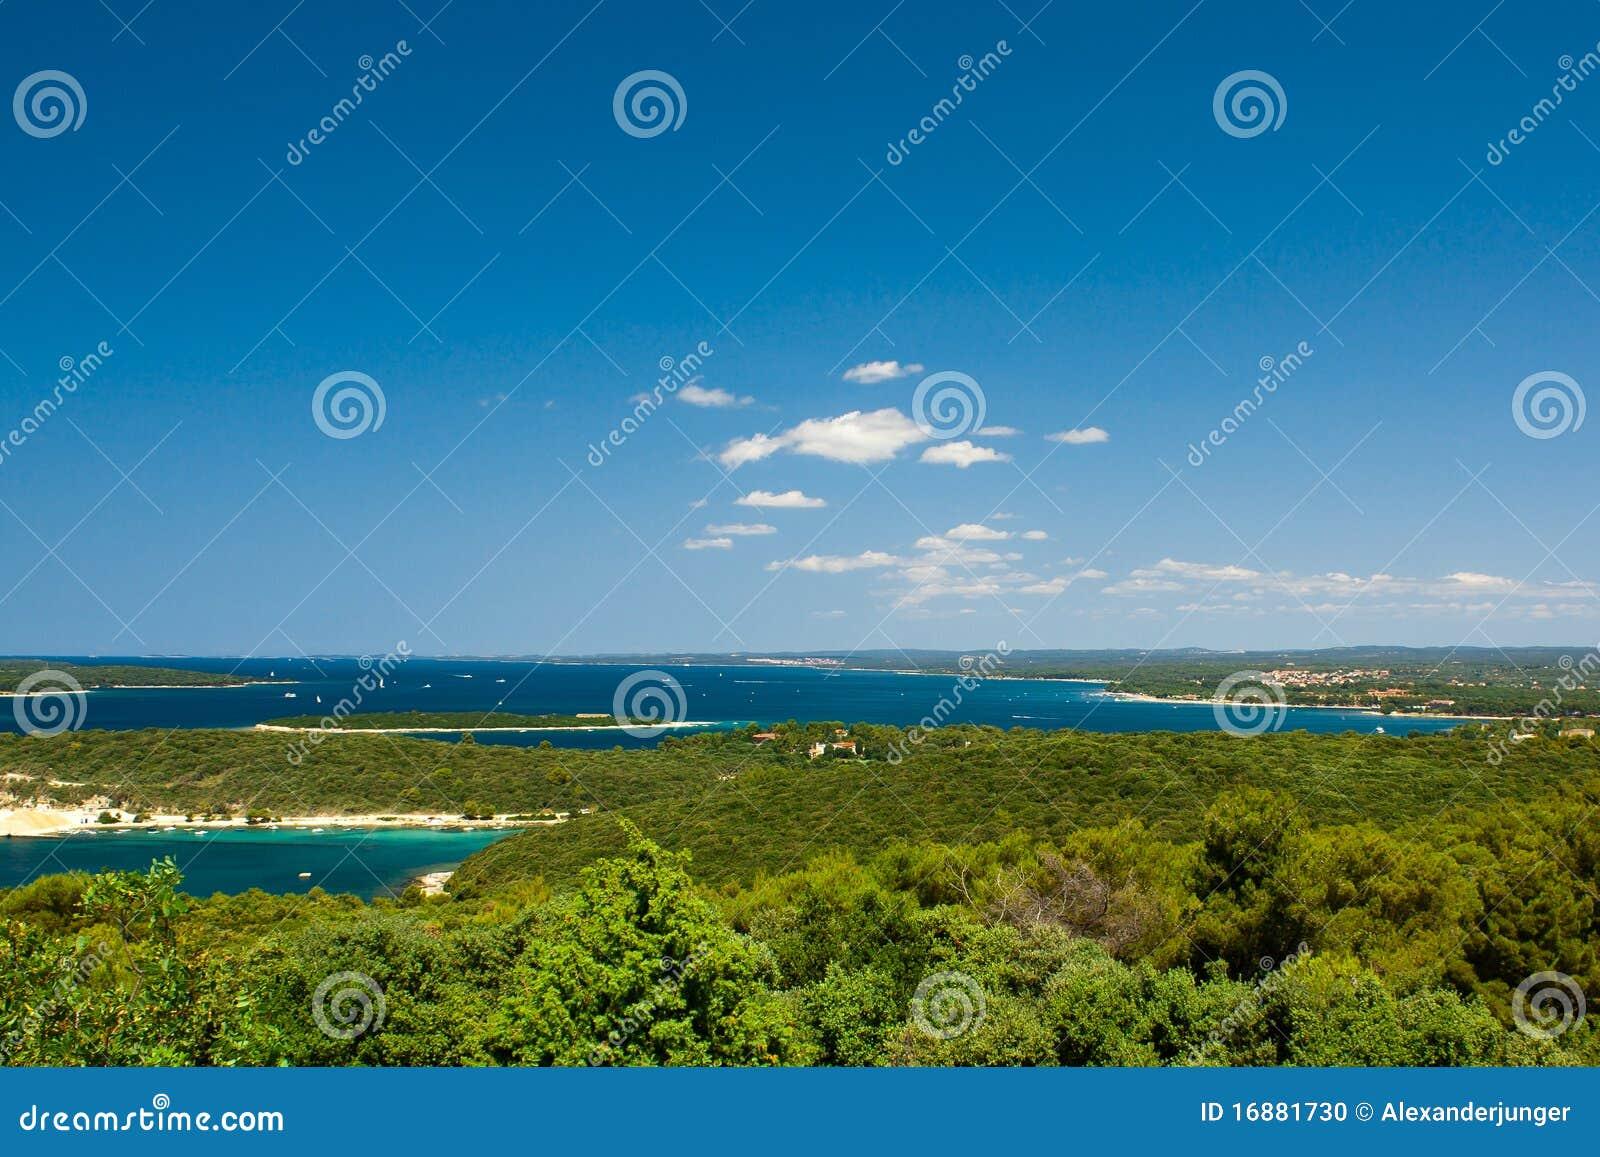 Kroatische Riviera